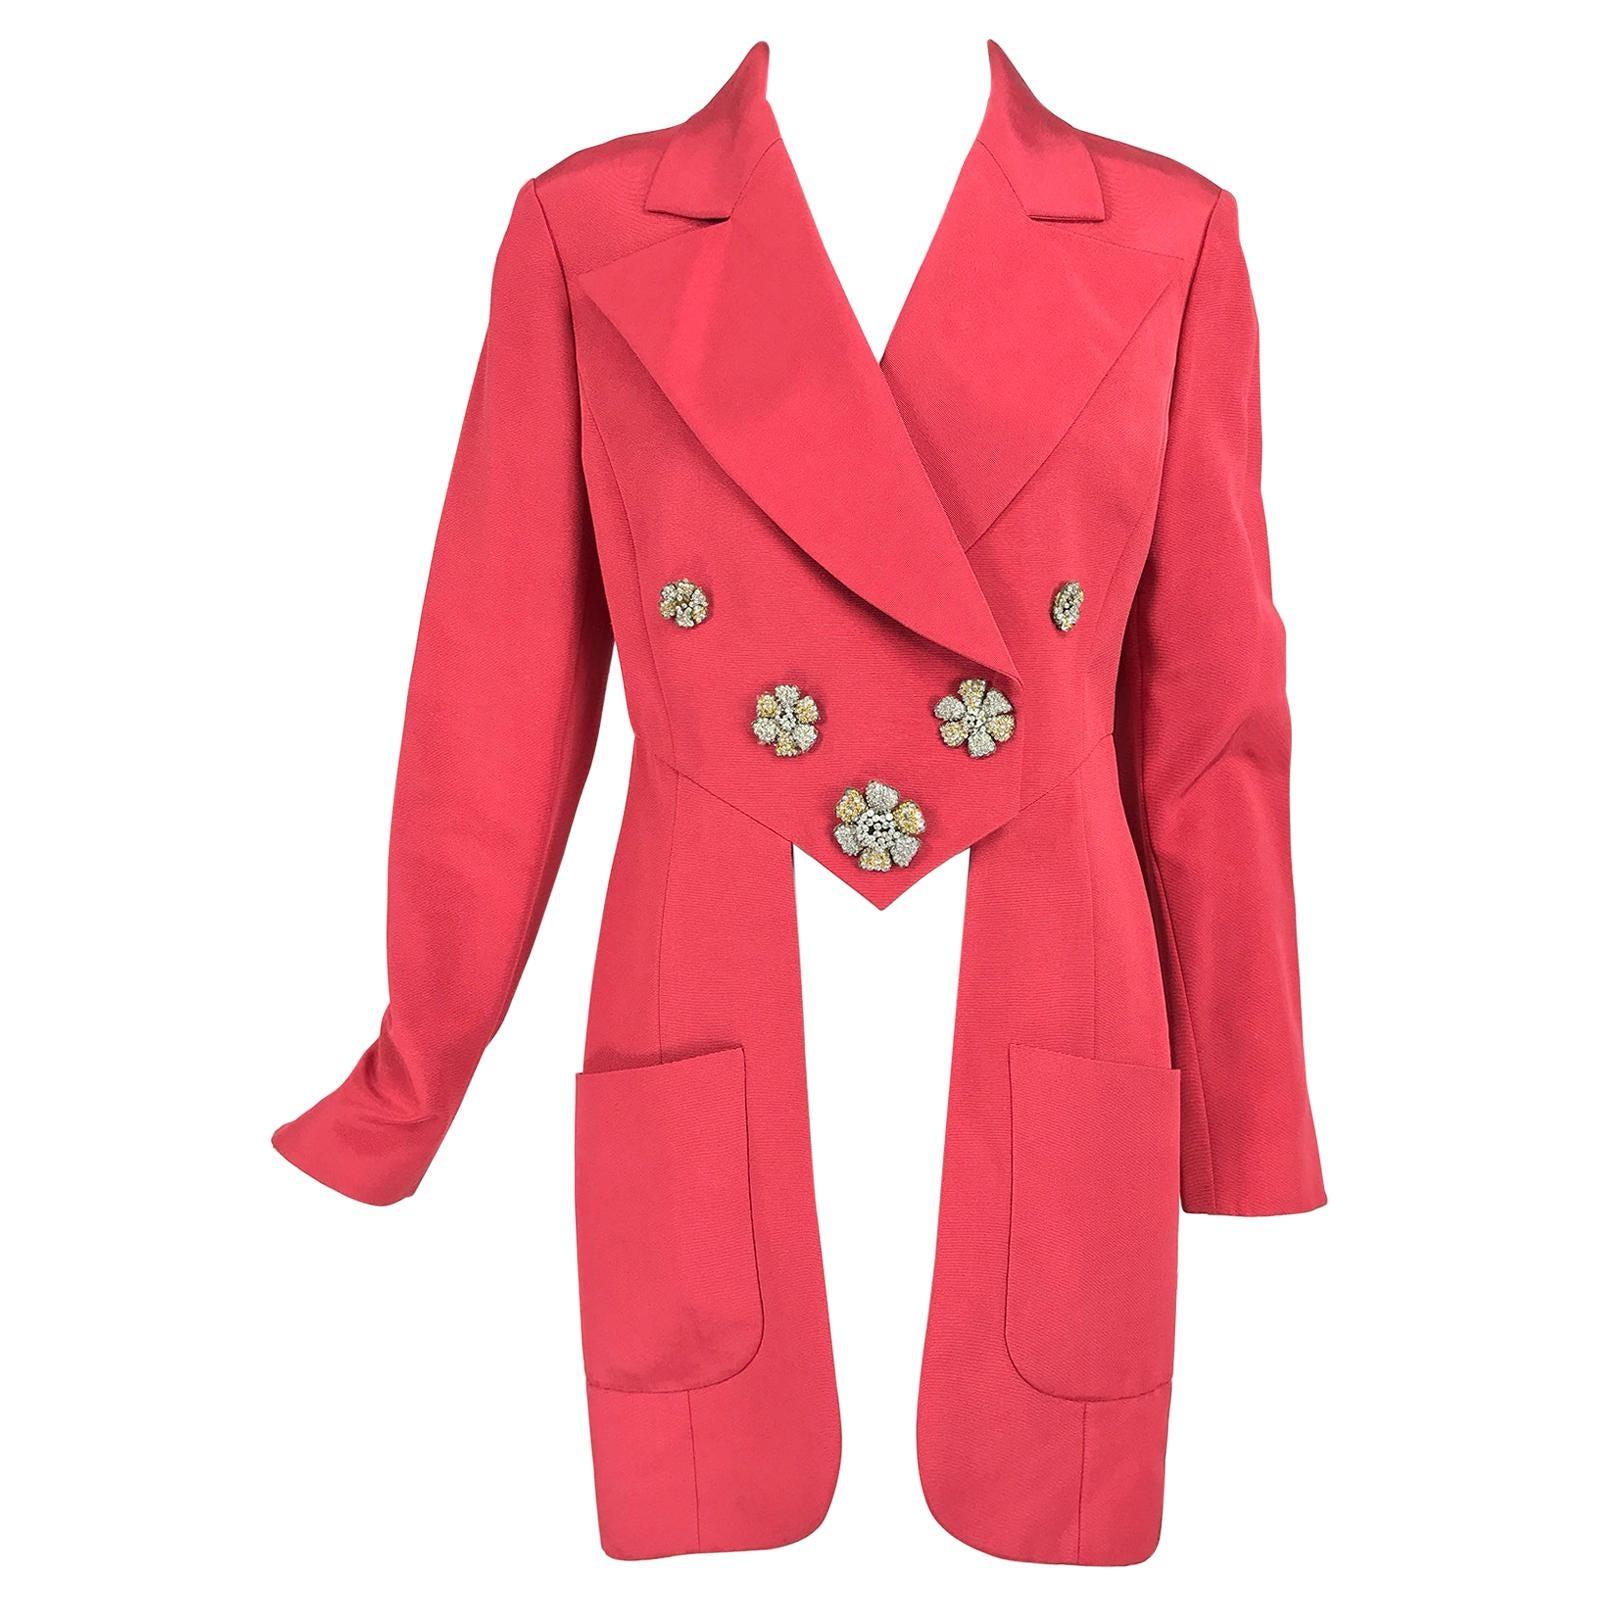 Karl Lagerfeld Coral Red Silk Faille Reddingote Style Coat 1990s